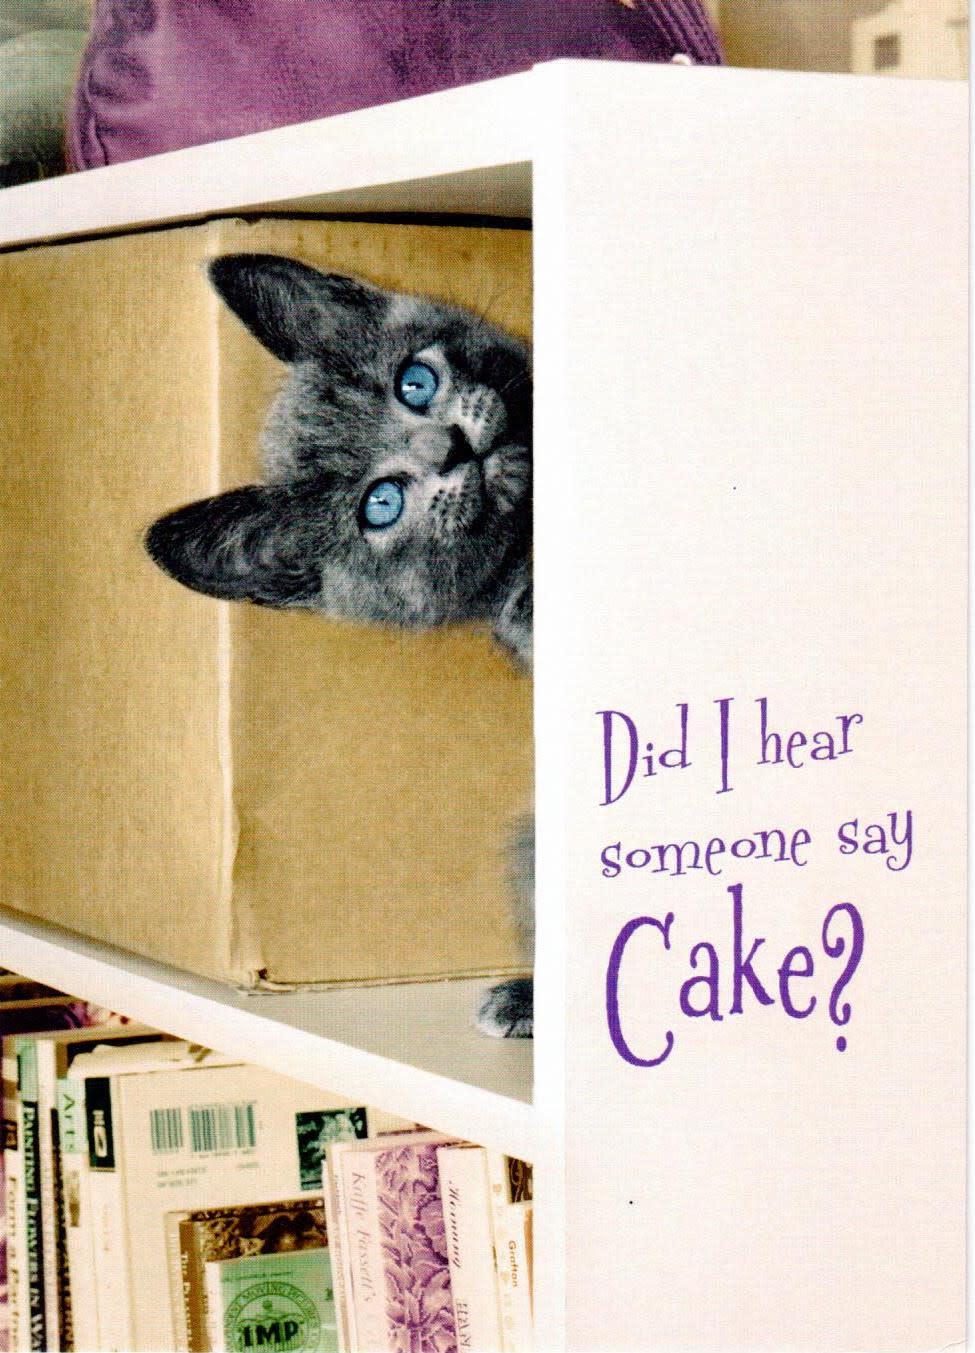 Did I Hear Someone Say Cake? - Kitten in Bookshelf